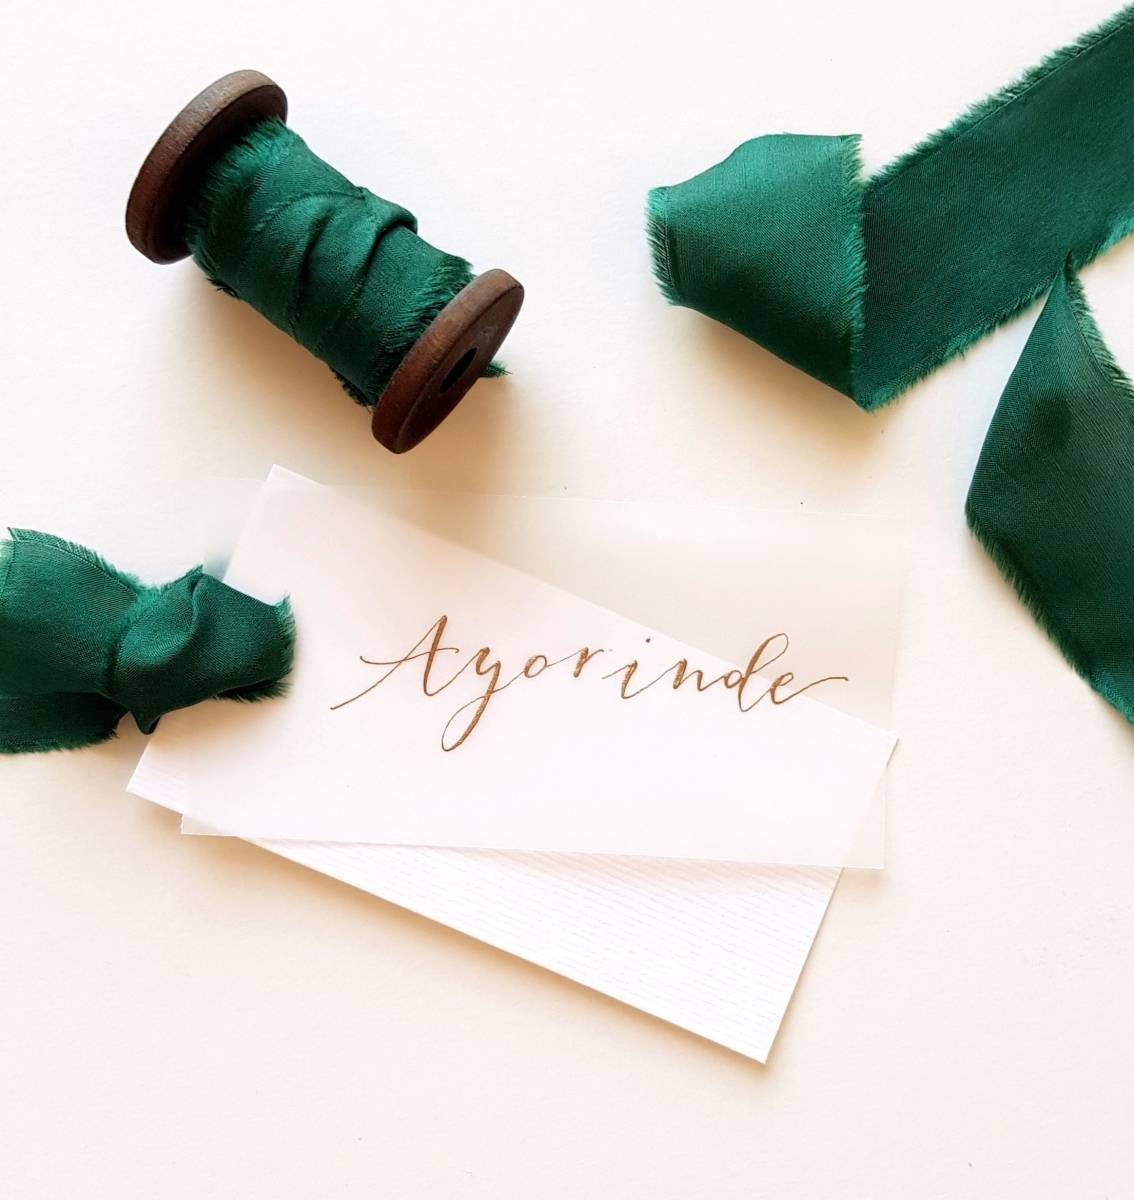 Touch of Gold - Workshops - Vrijgezellen - Trouwuitnodiging - Huwelijksuitnodiging - Kalligrafie - House of Weddings - 8